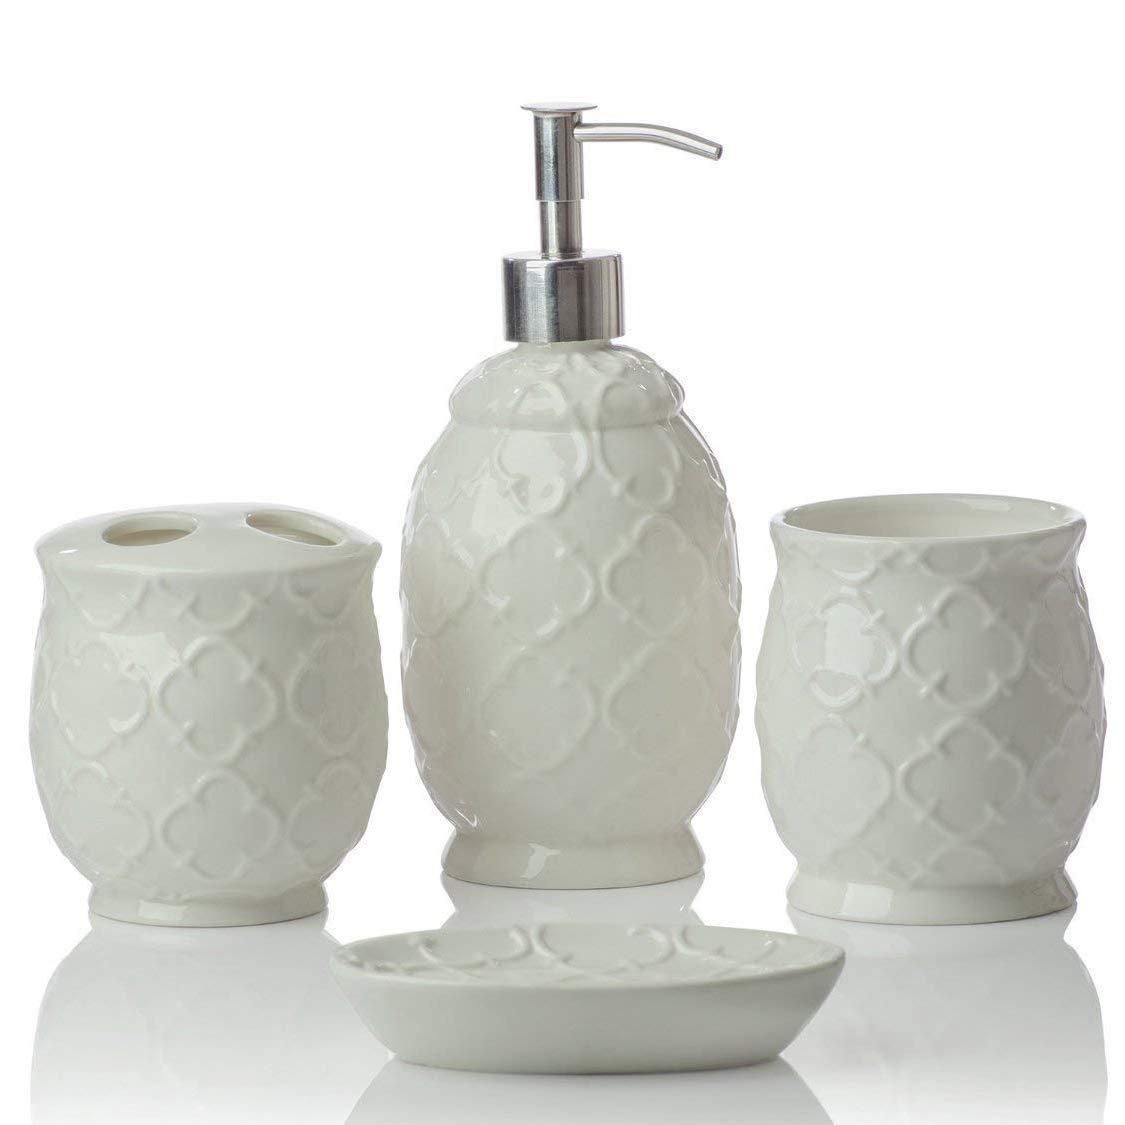 Amazoncom Designer 4 Piece Ceramic Bath Accessory Set Includes